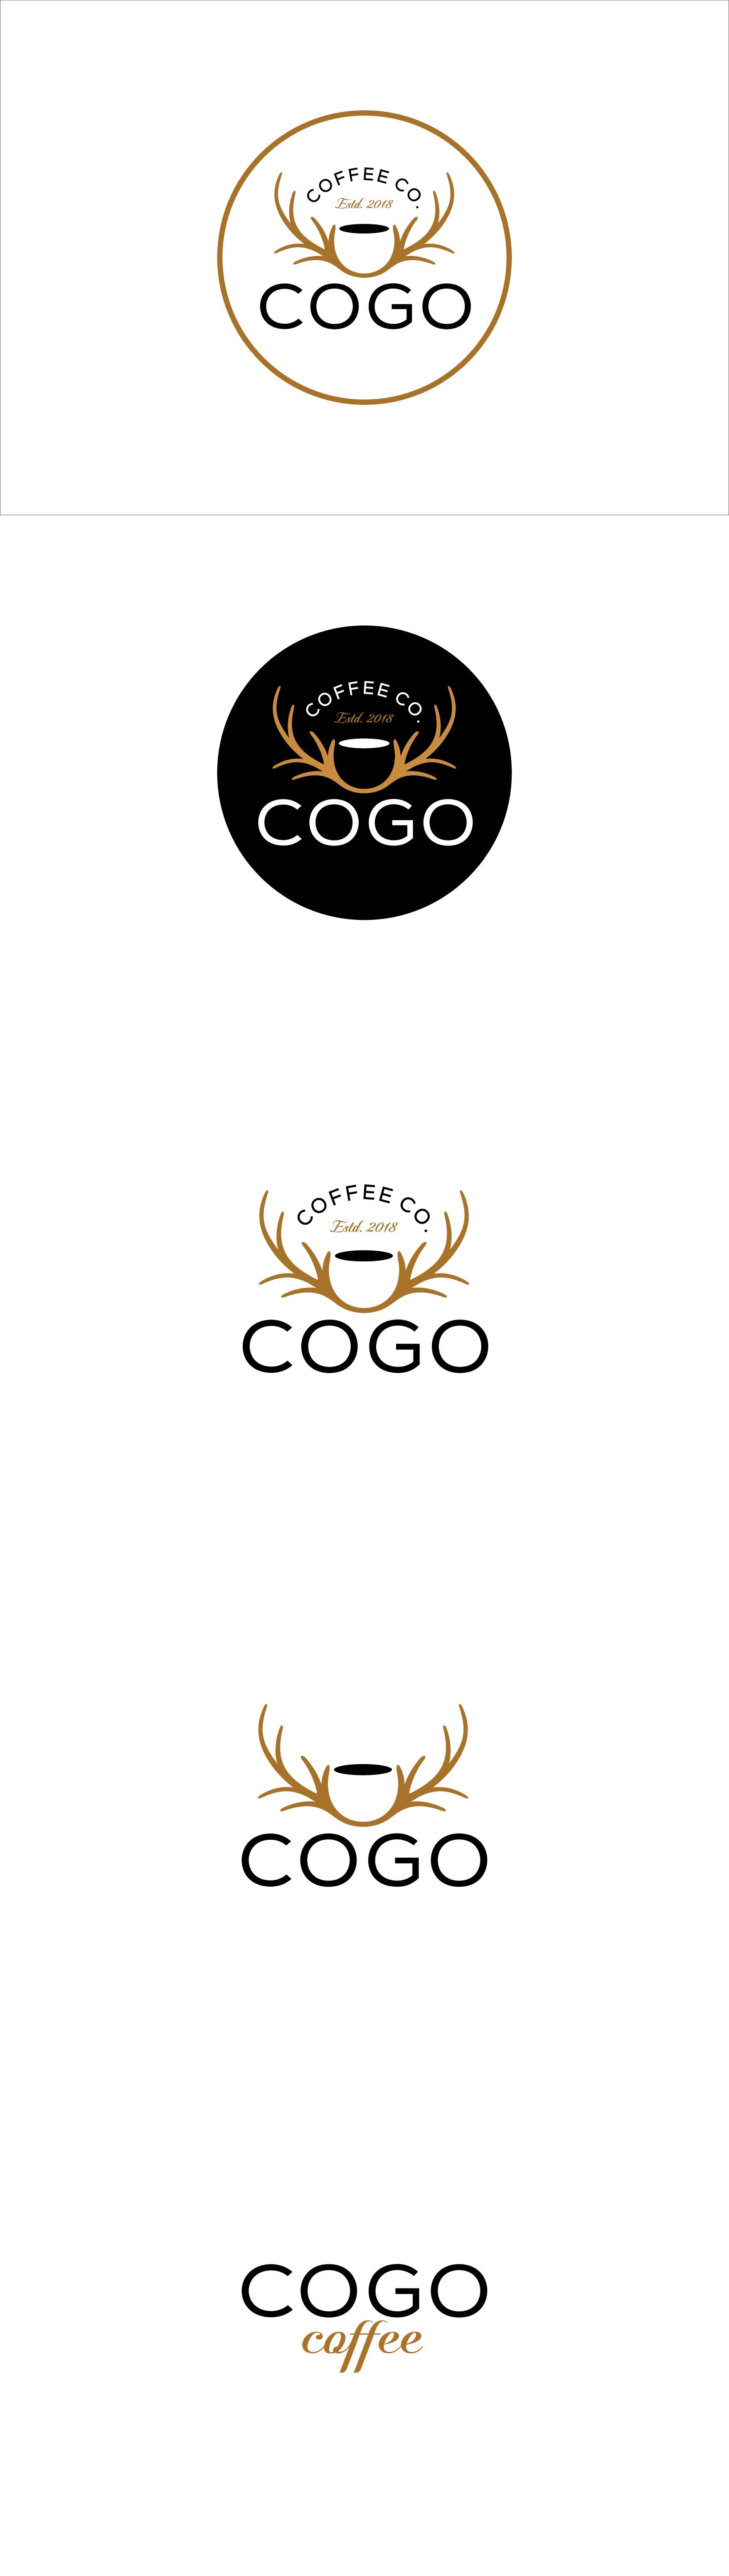 Crush Starbucks: design a memorable image for a new coffee company